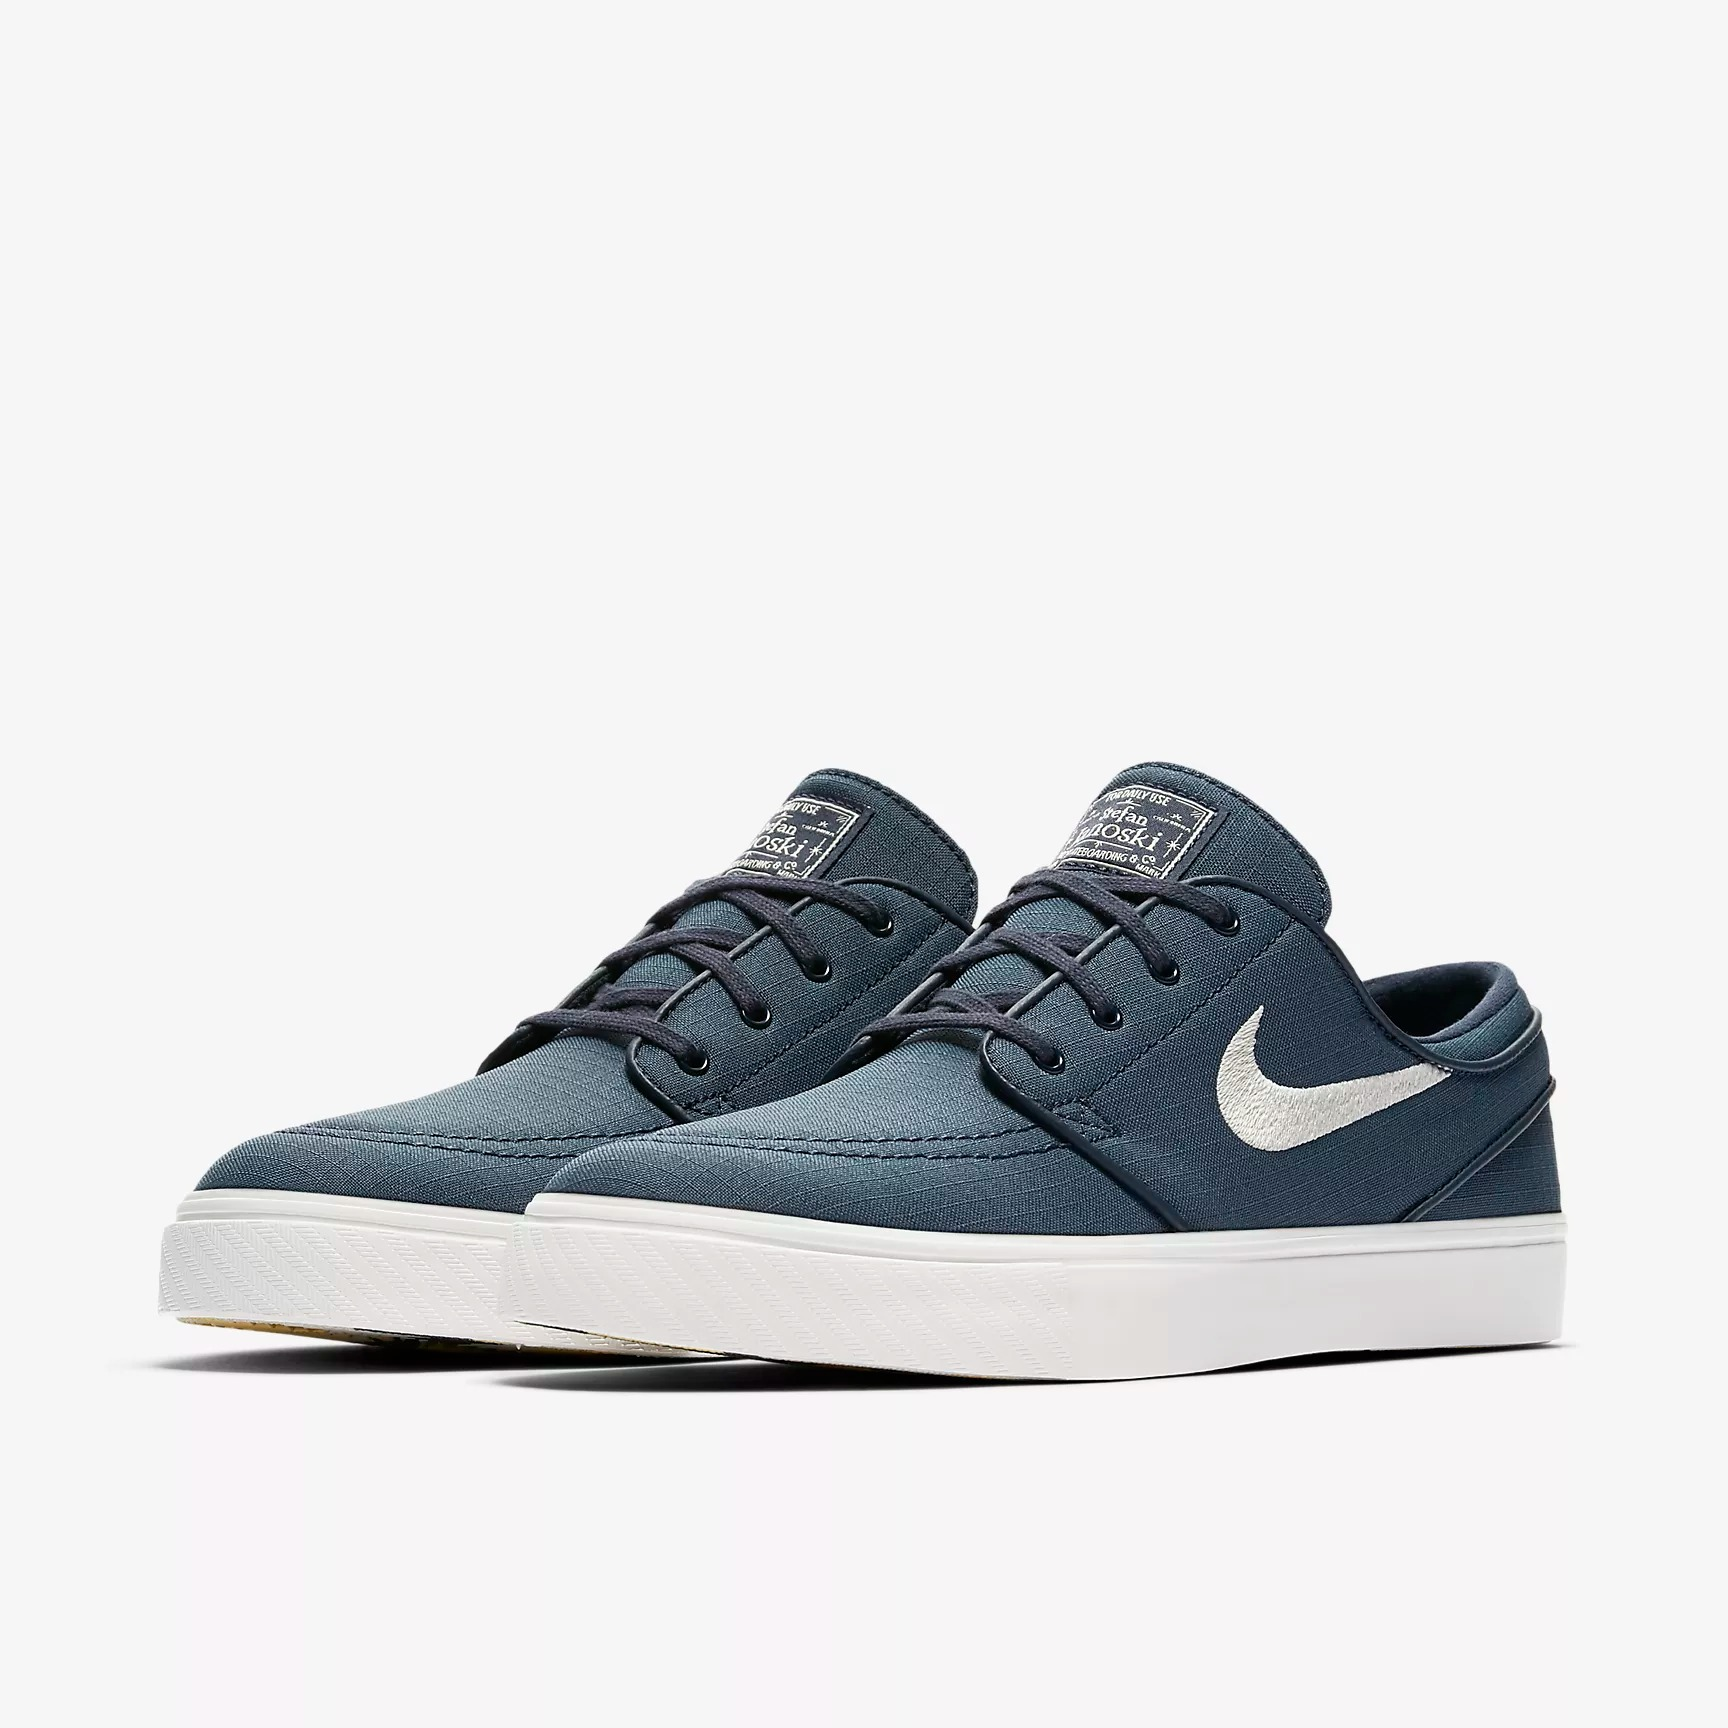 size 40 655d4 b201d Nike SB Zoom Stefan Janoski Canvas Skateboarding Shoes - SPORT SHOES  Lifestyle Shoes   Sneakers - Superfanas.lt